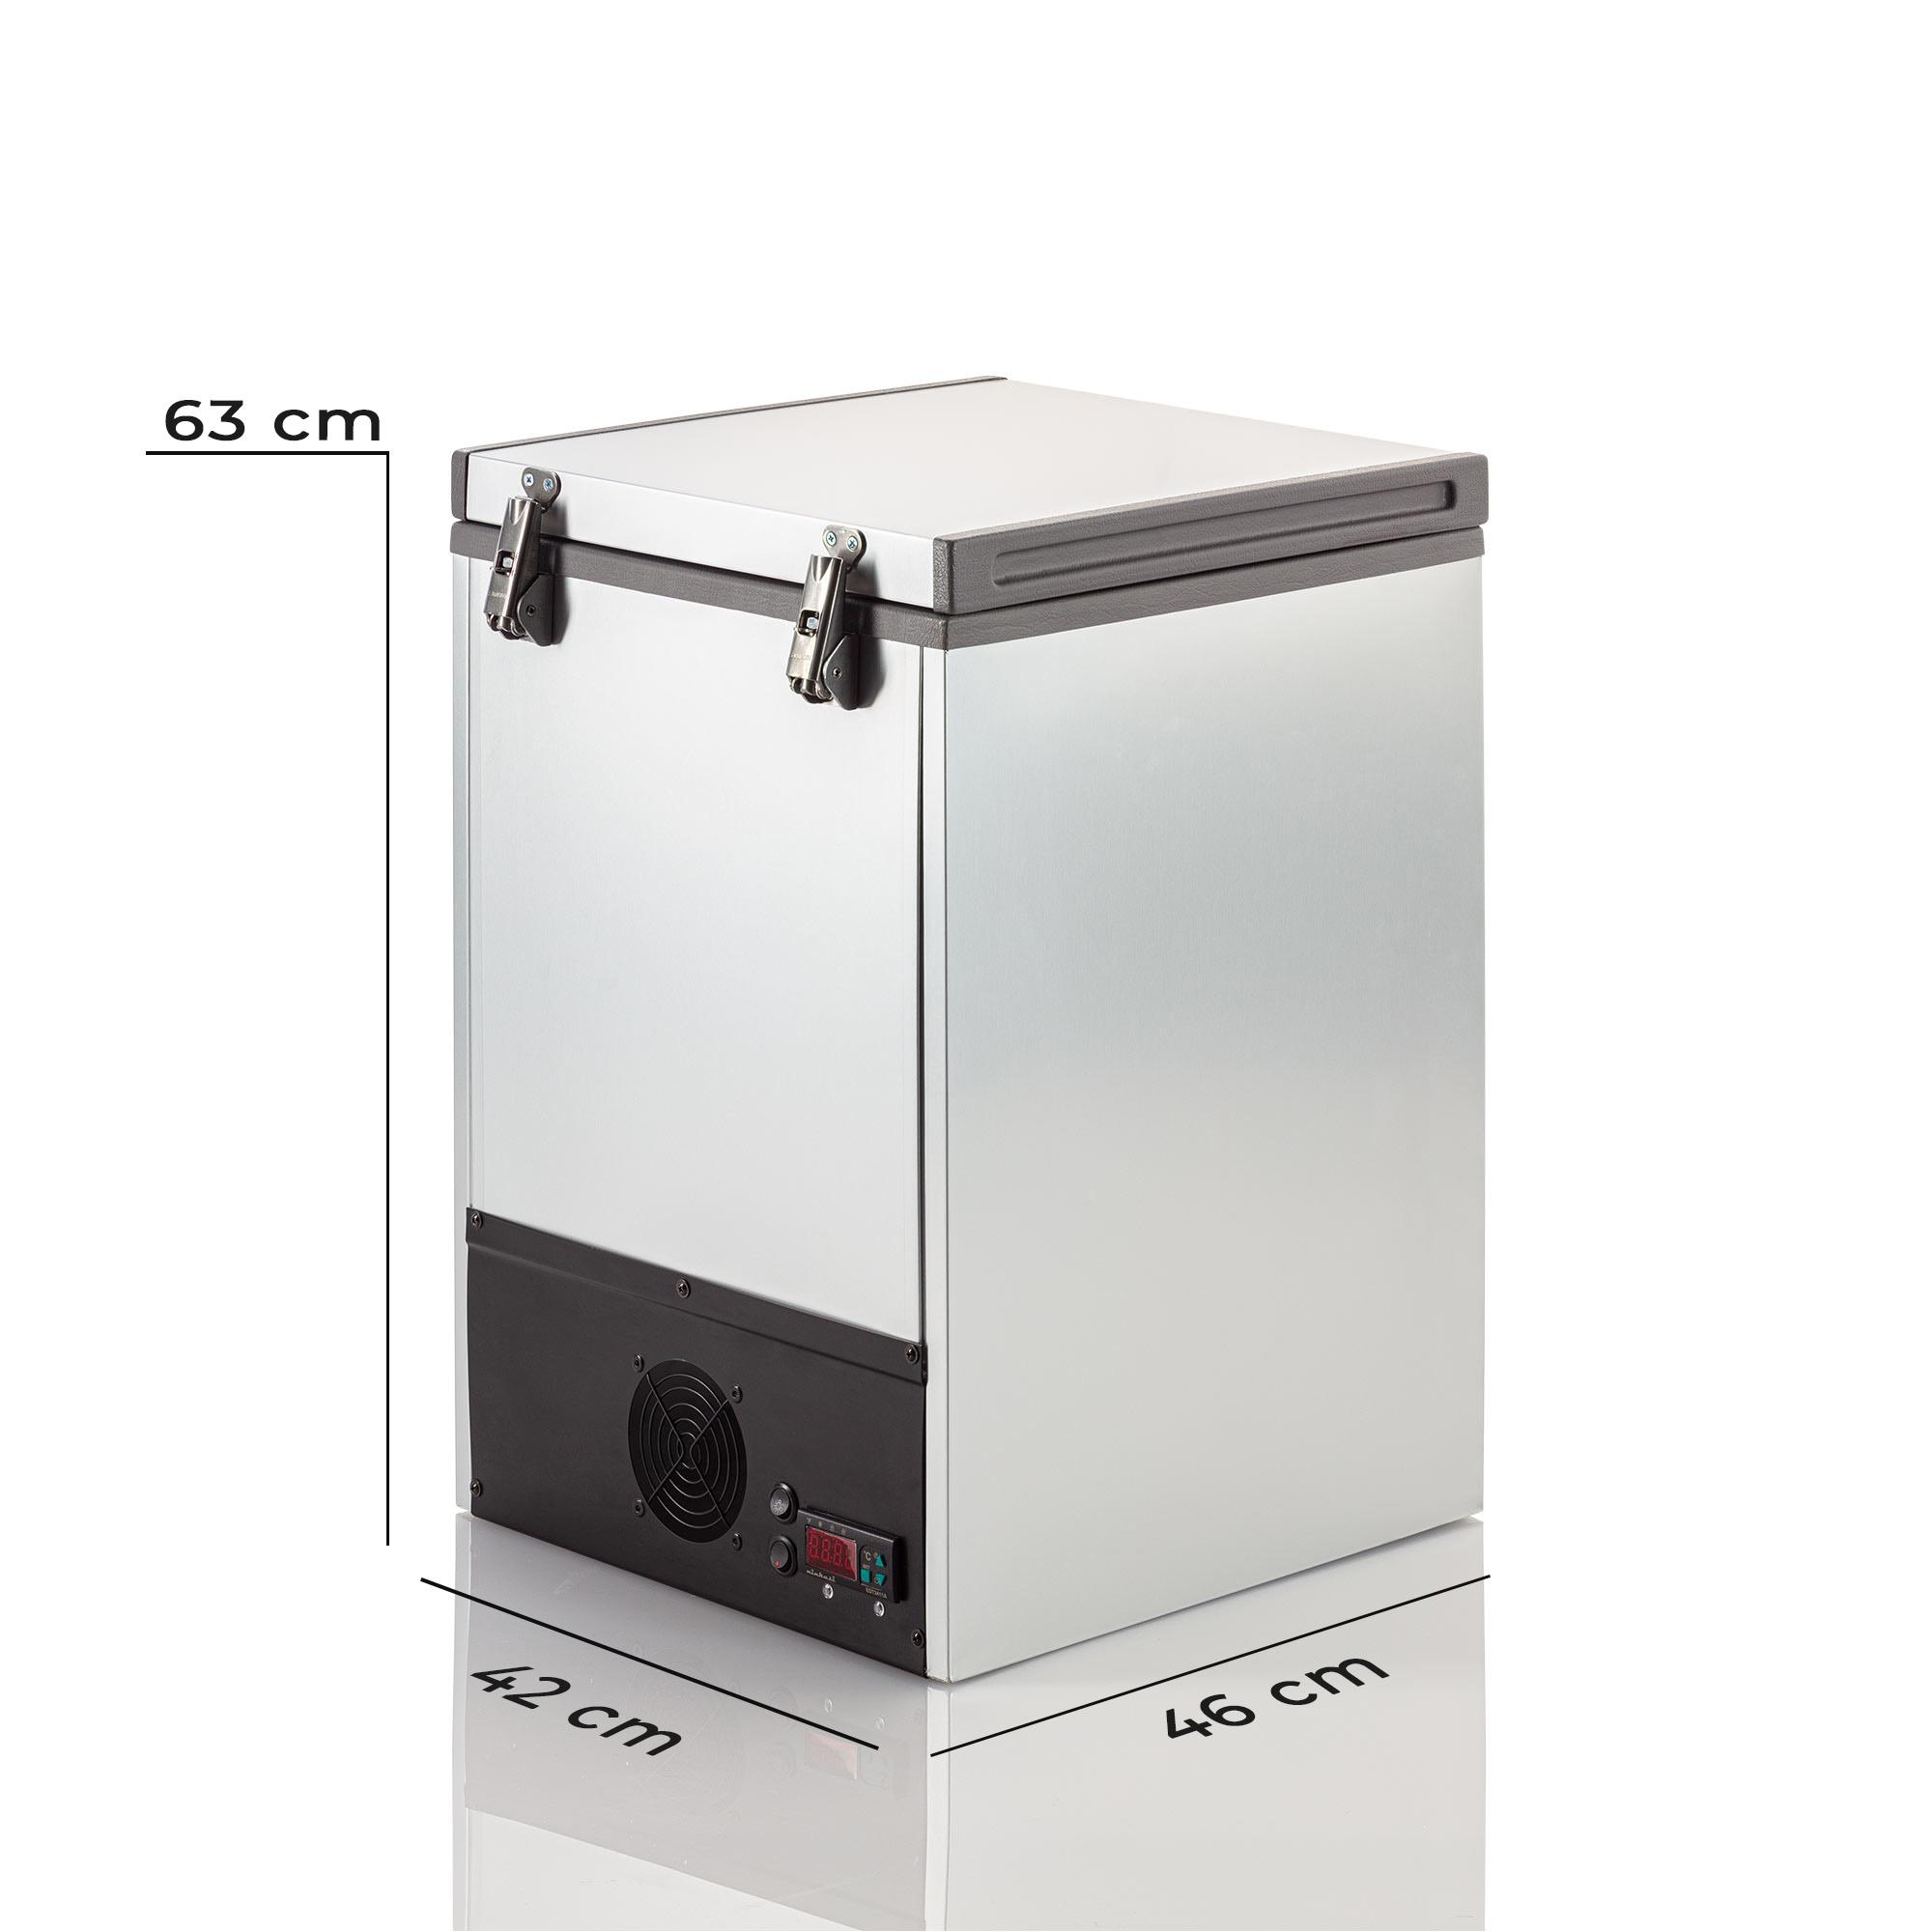 MPO 4262 / 36 LT Soğutucu Araç Buzdolabı